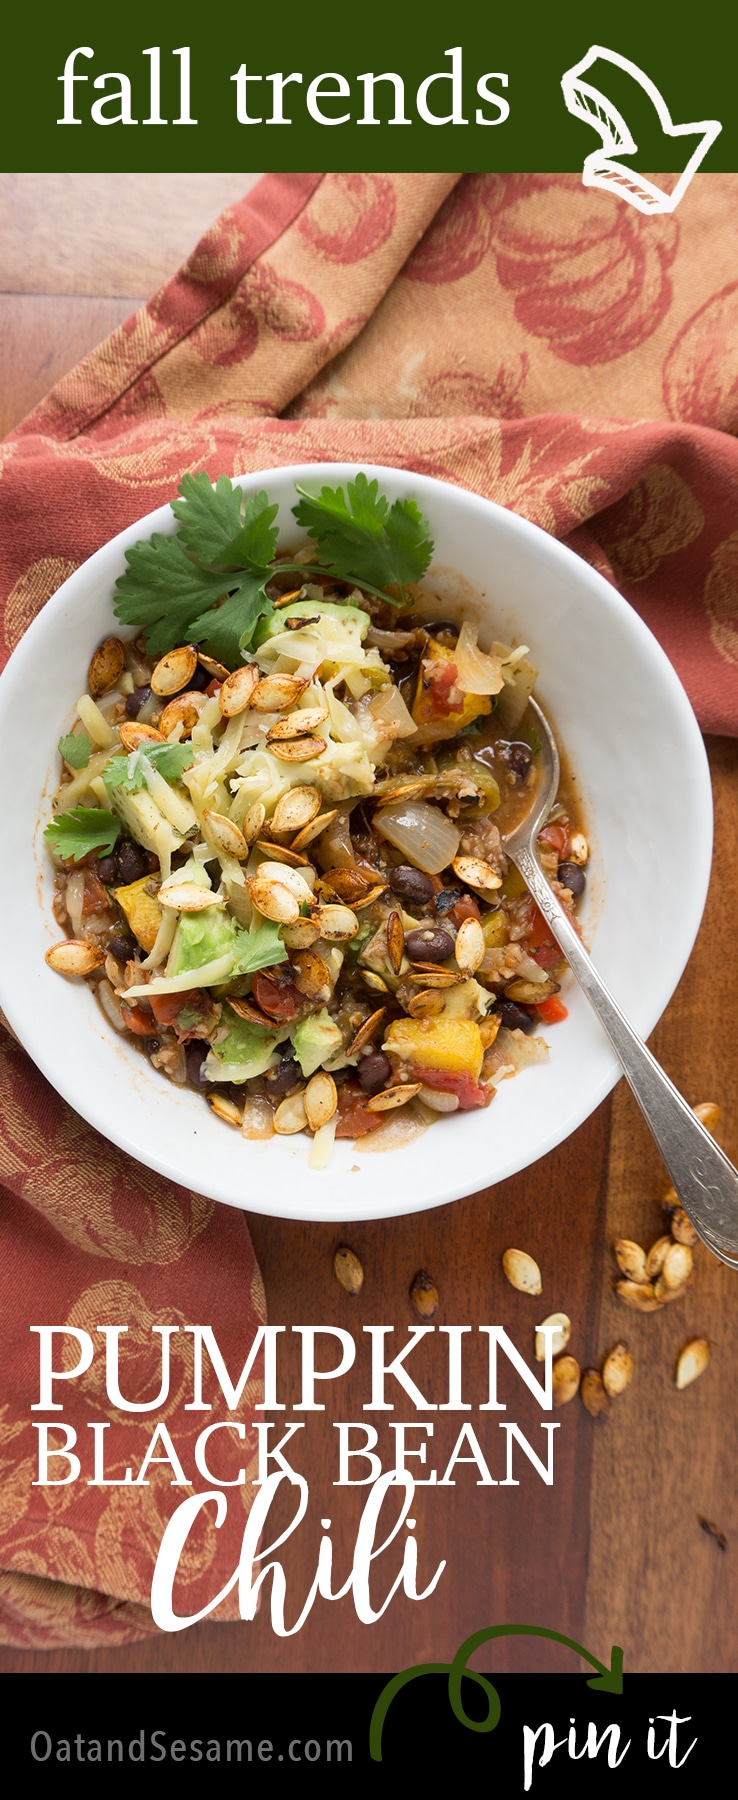 Fall Pumpkin Black Bean Chili - perfect for weeknight meals | #CHILI | #FALL | #DINNER | #Recipes at OatandSesame.com